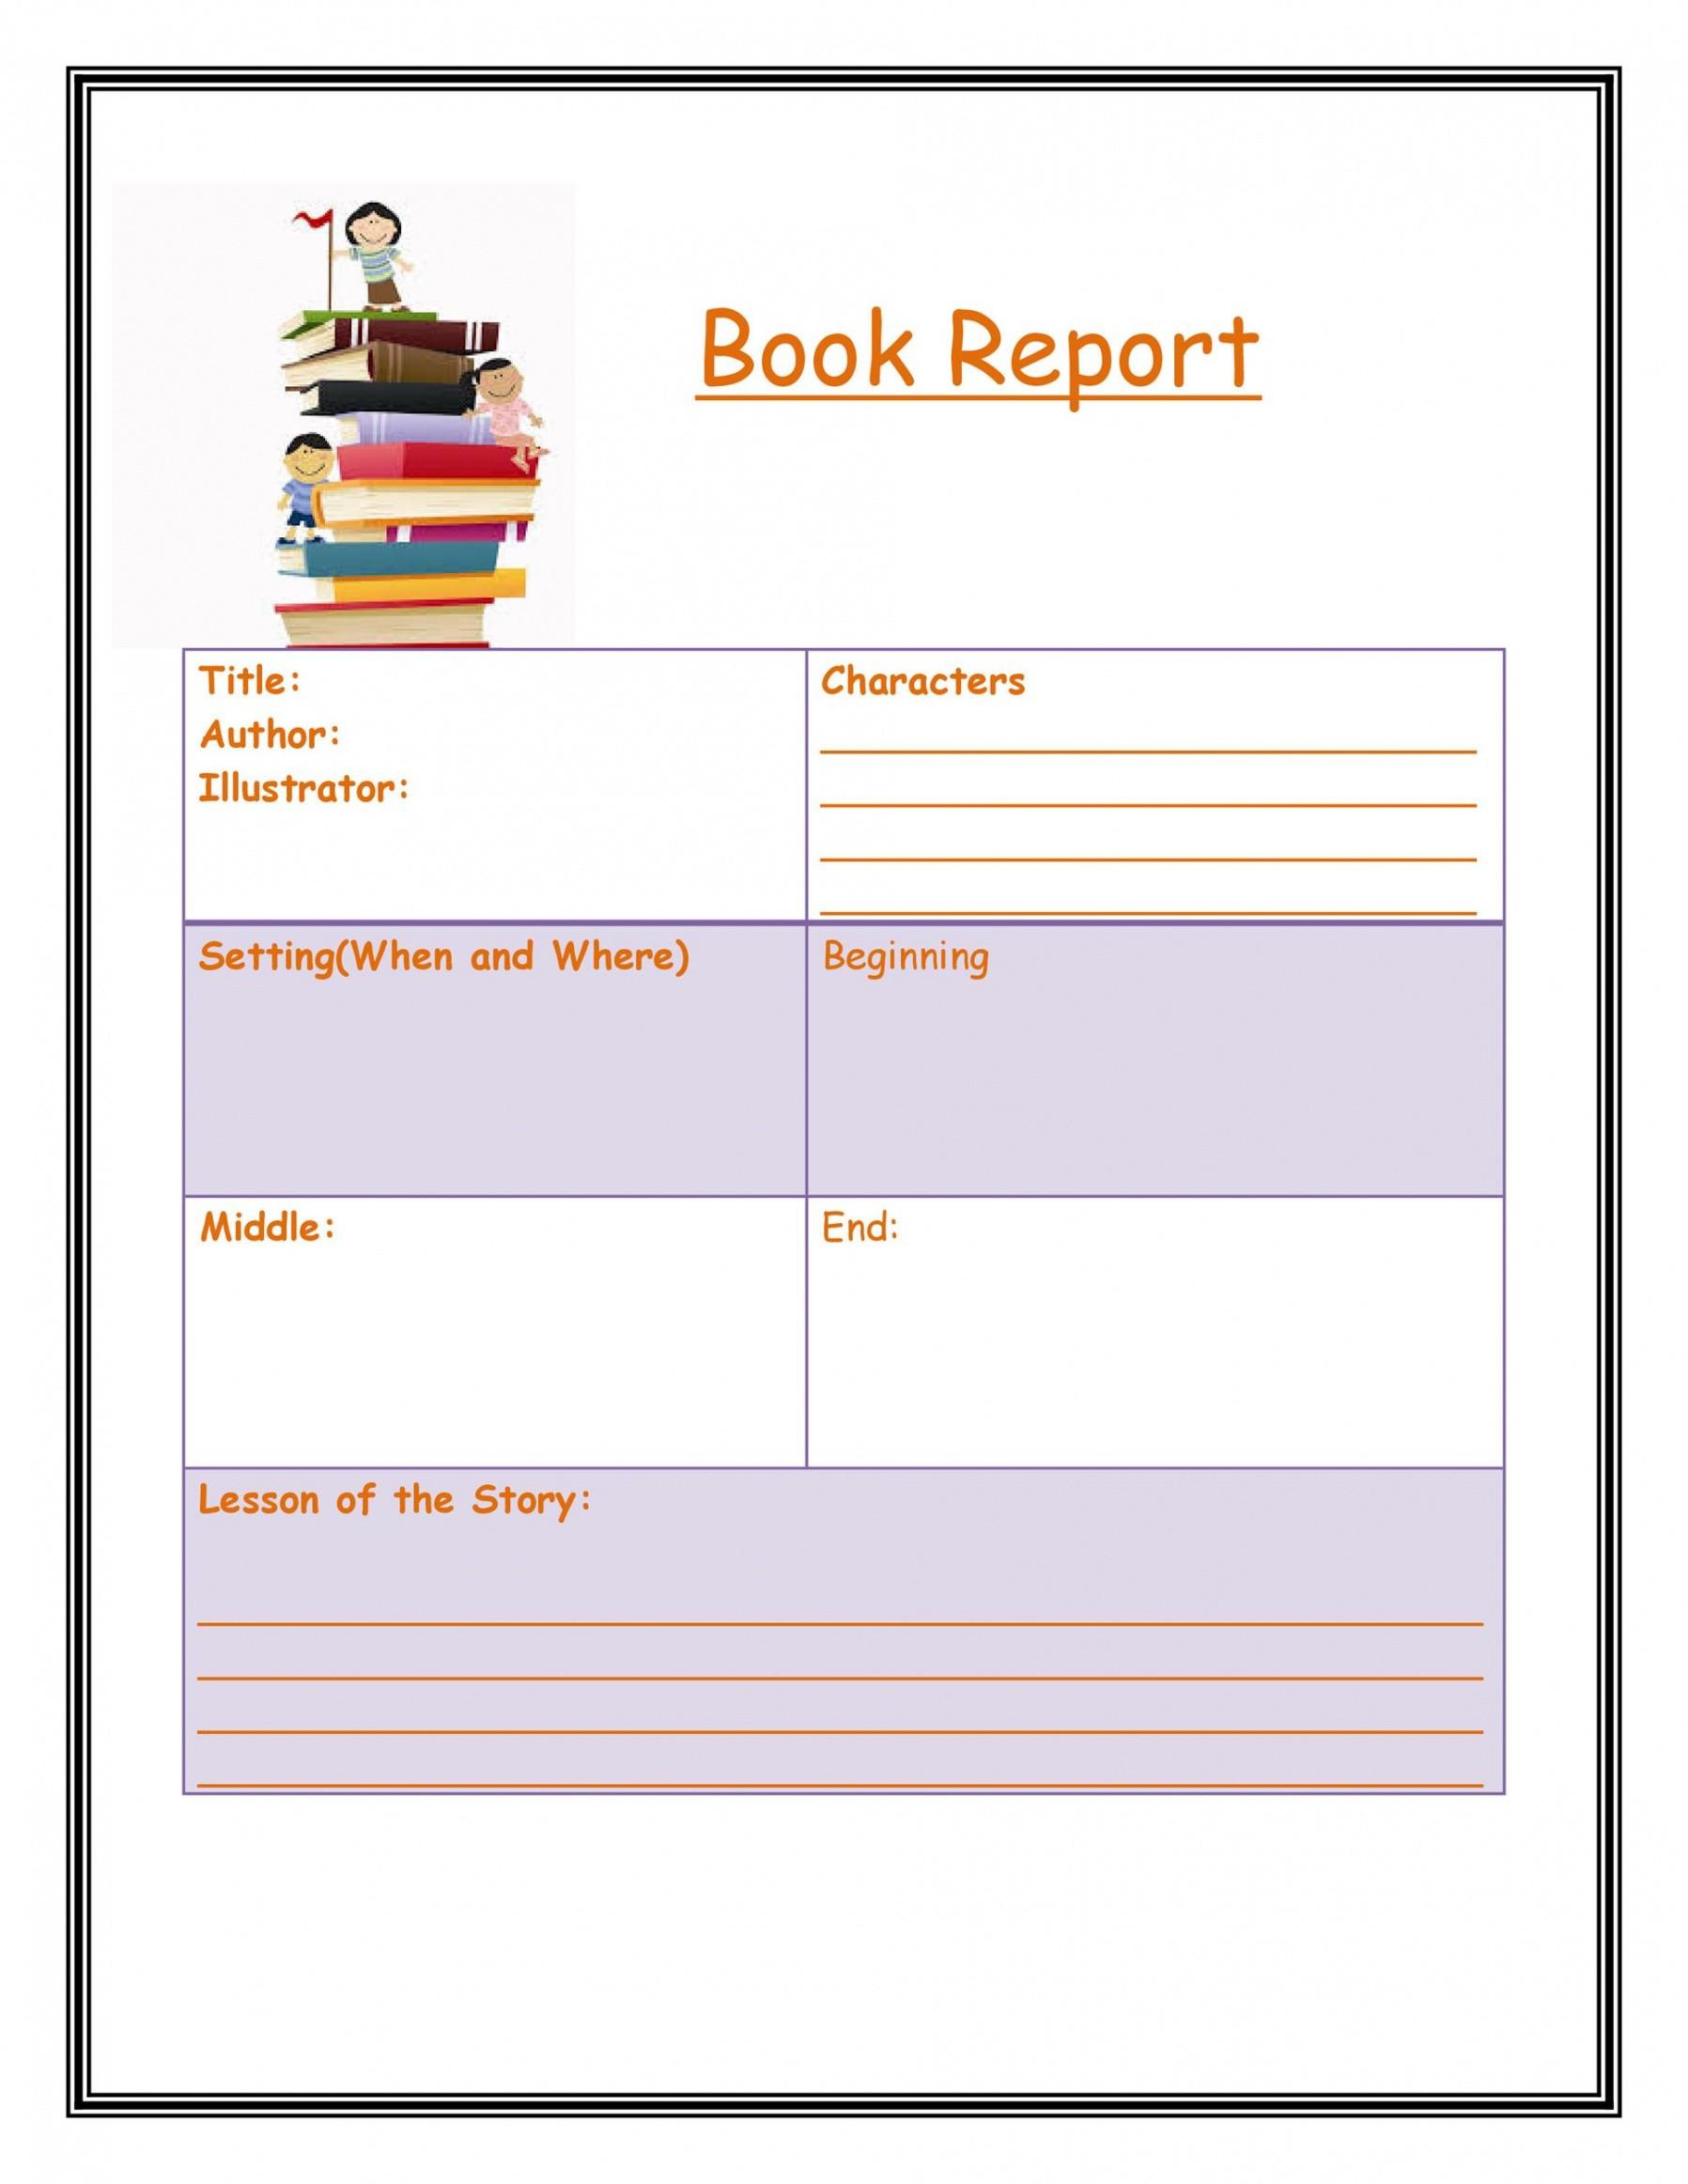 costum book report outline template